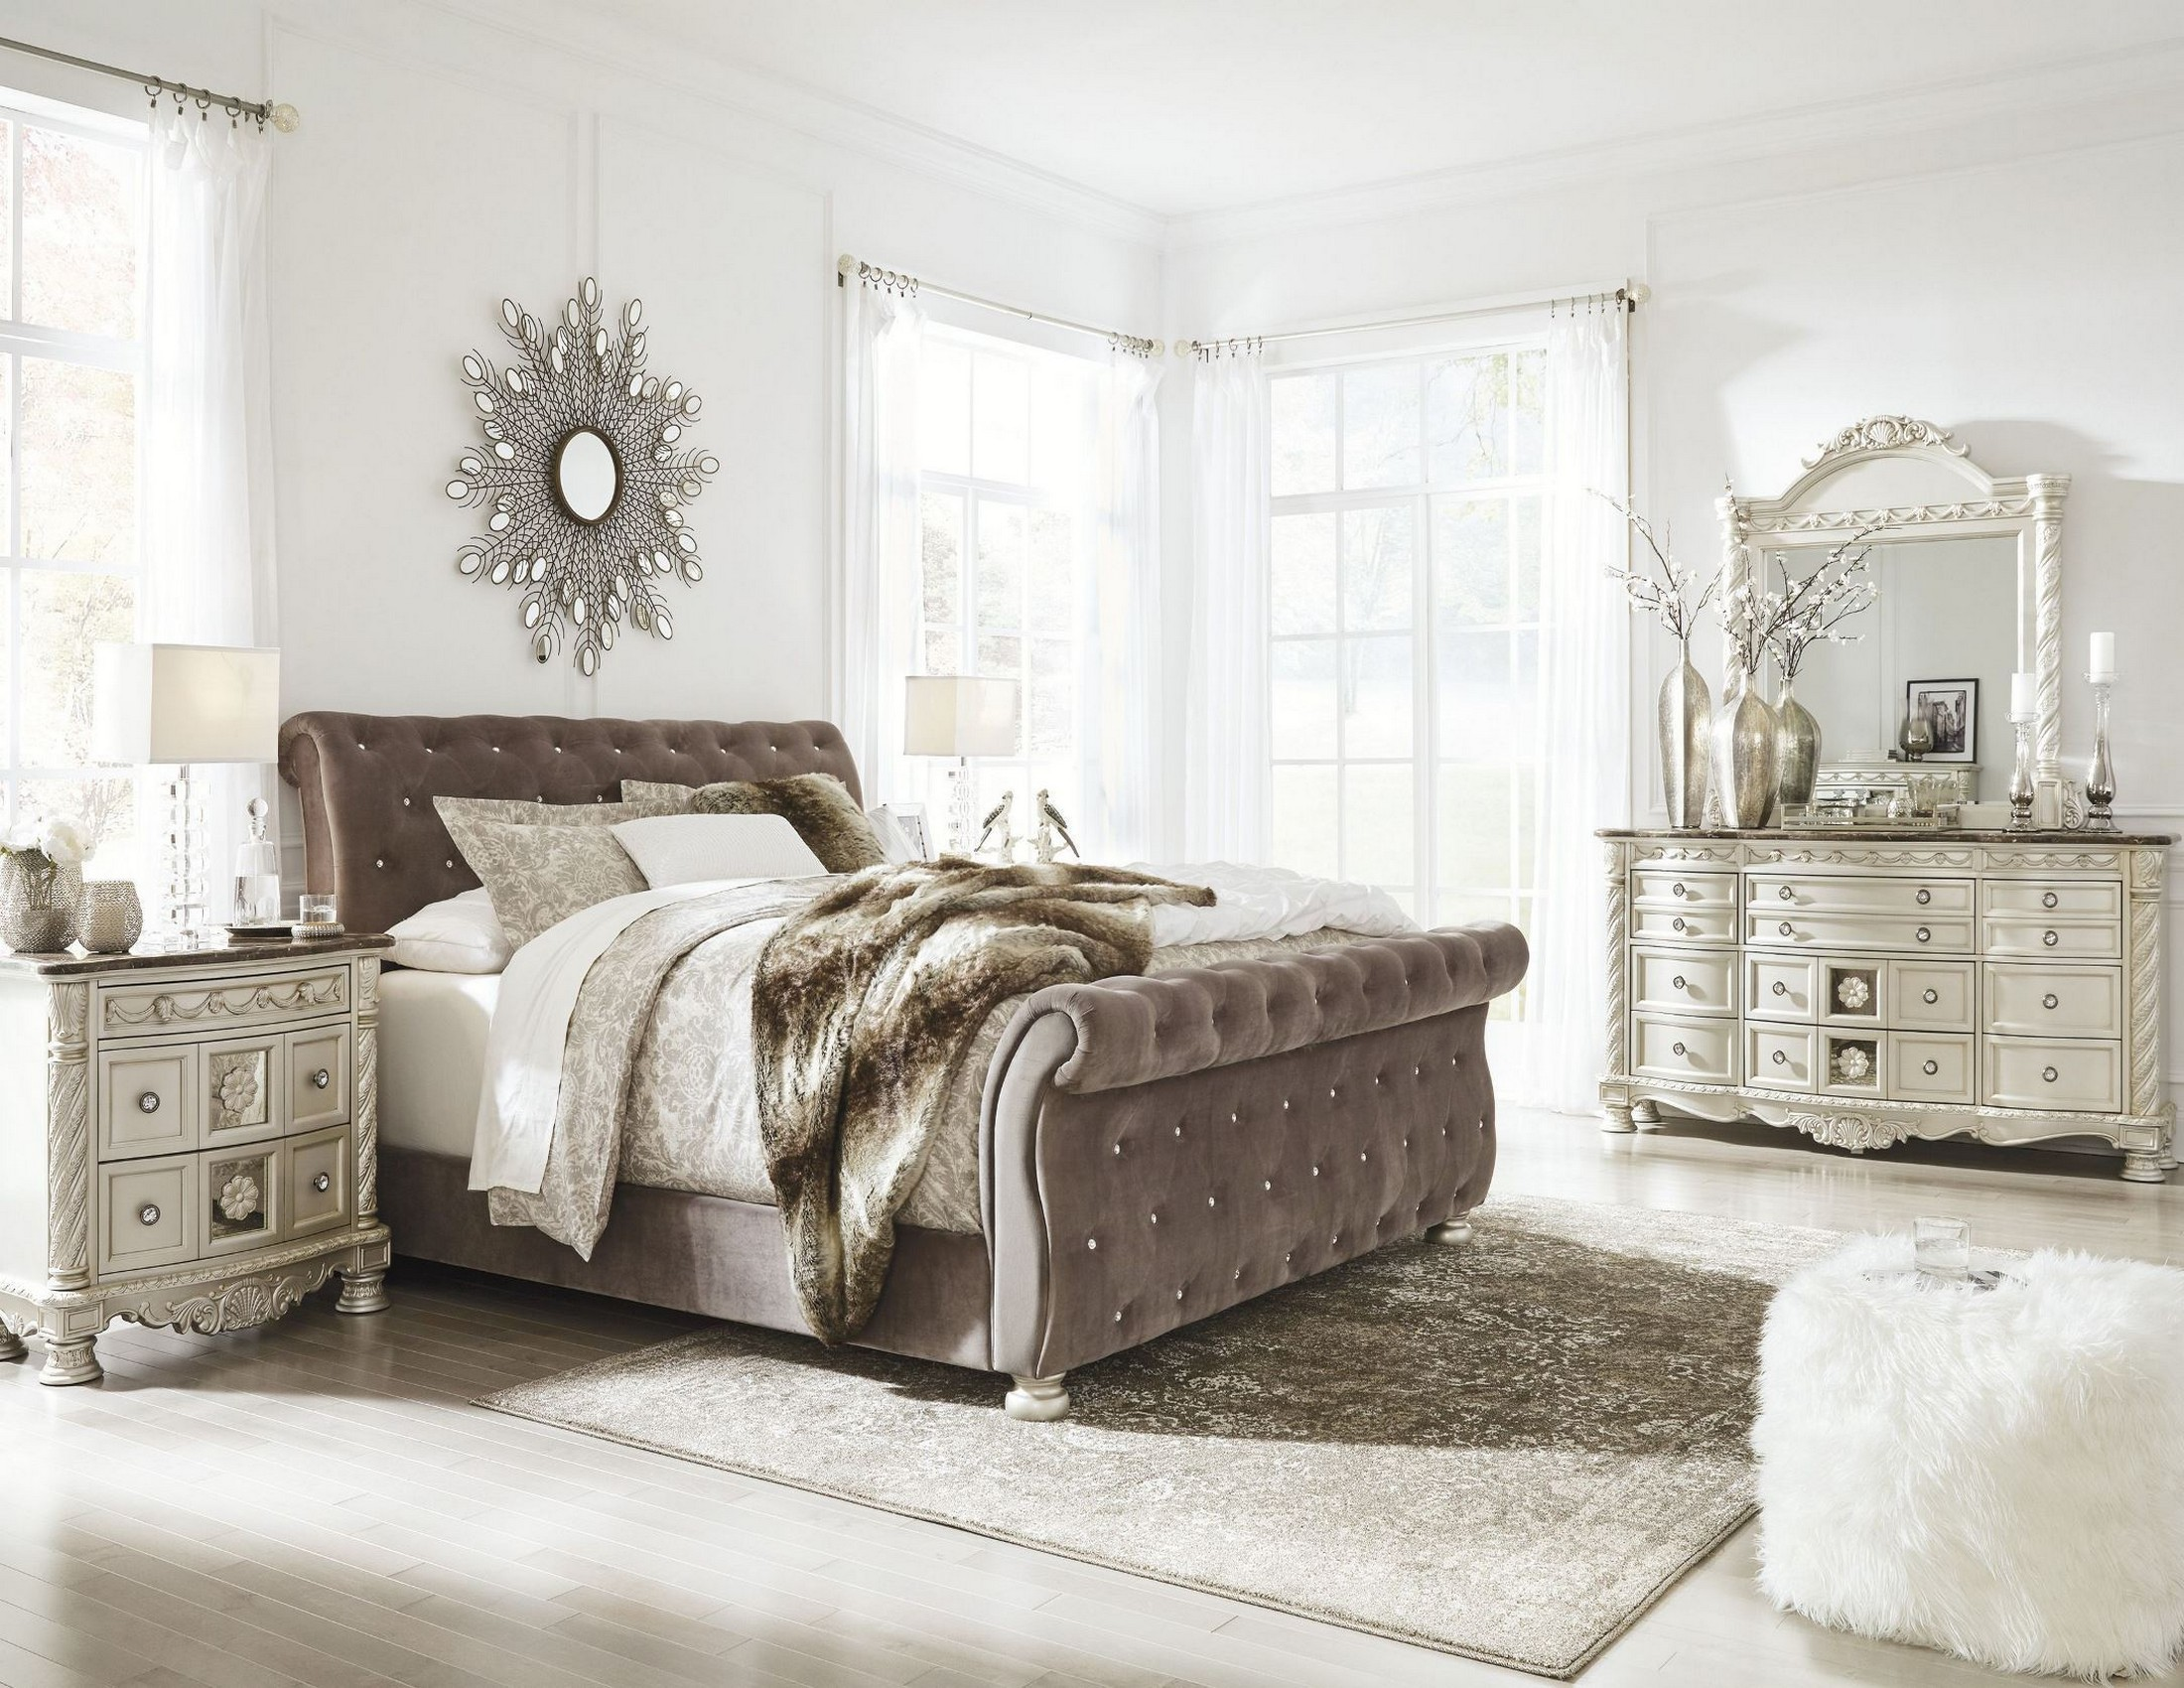 Wayfair Bedroom Bedroom Chairs Bedroom Furniture Bedroom: Cassimore North Shore Pearl Silver Upholstered Bedroom Set